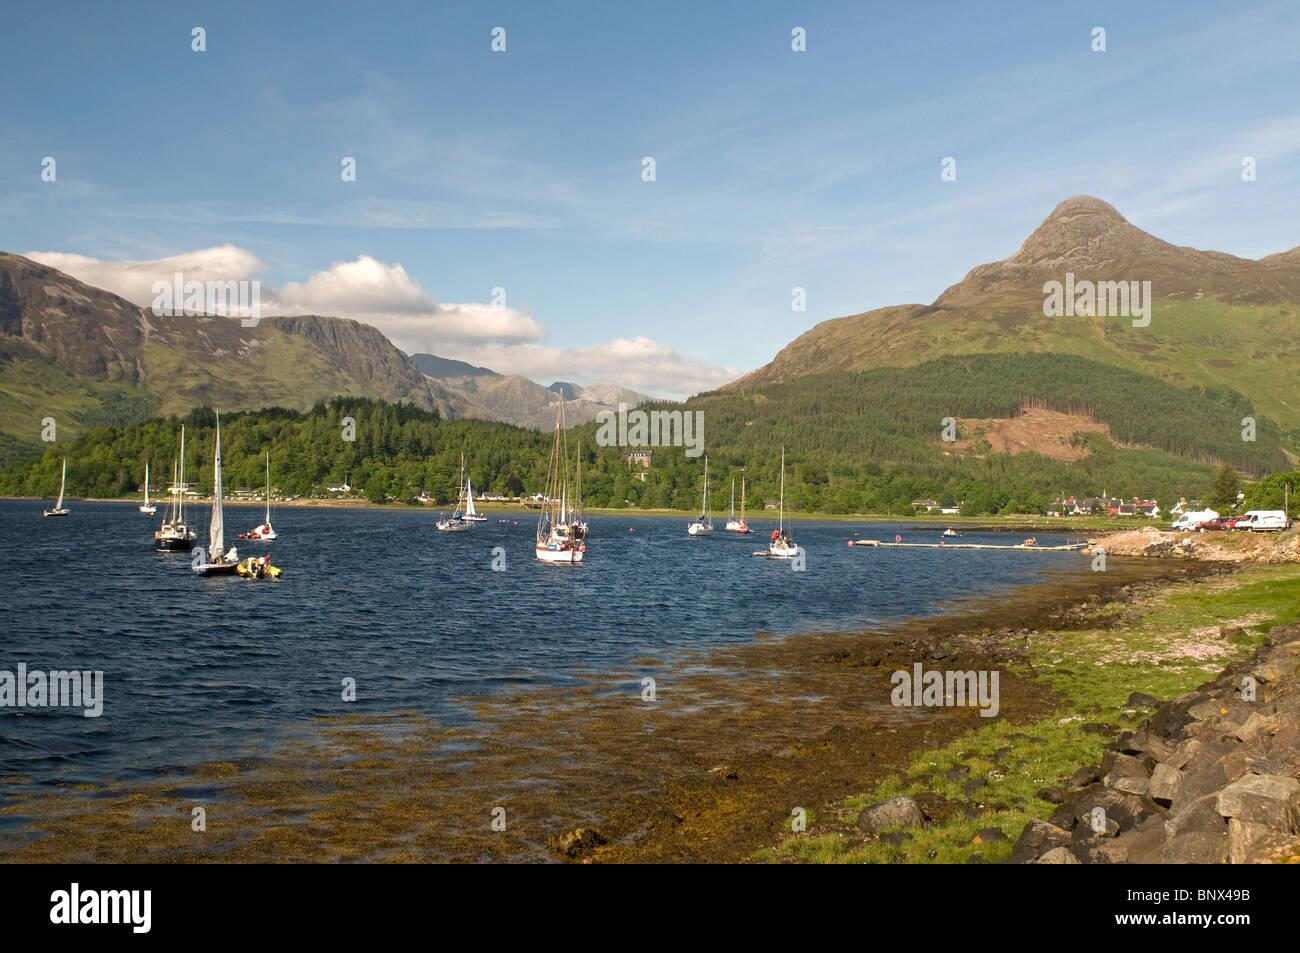 Yachts on Loch Leven, Ballachulish, Glencoe,  Inverness-shire, Highland Region. Scotland.  SCO 6211 - Stock Image